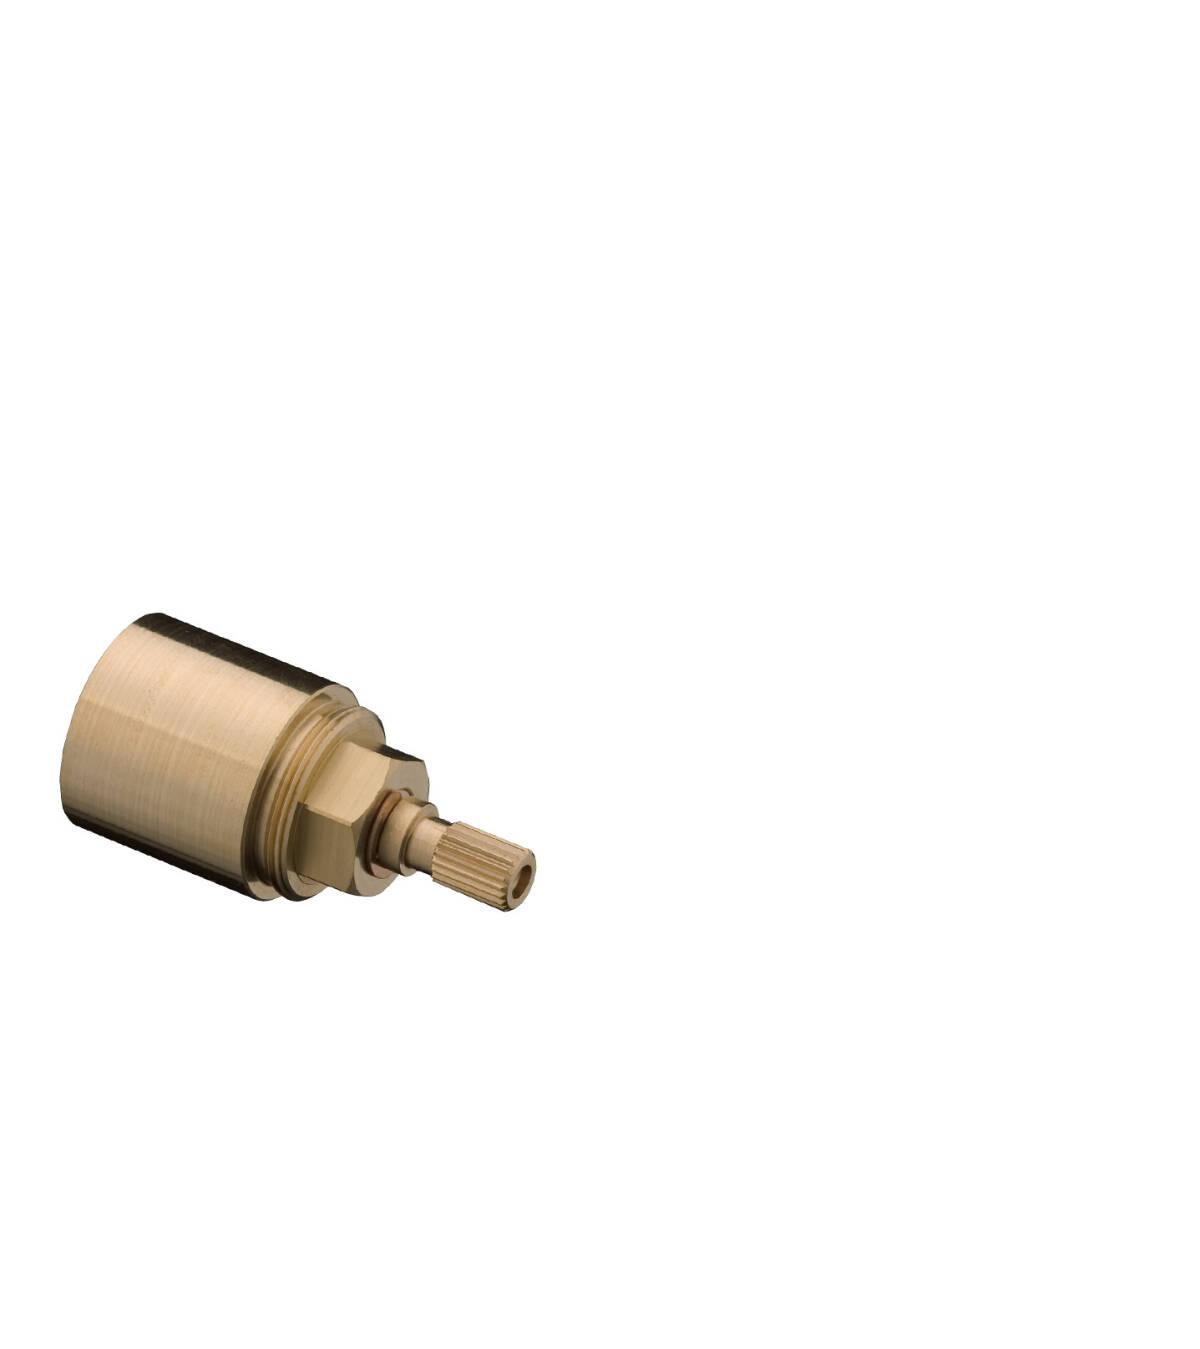 Extension set 25 mm for shut-off/ diverter valve Trio-/ Quattro, n.a., 92990000